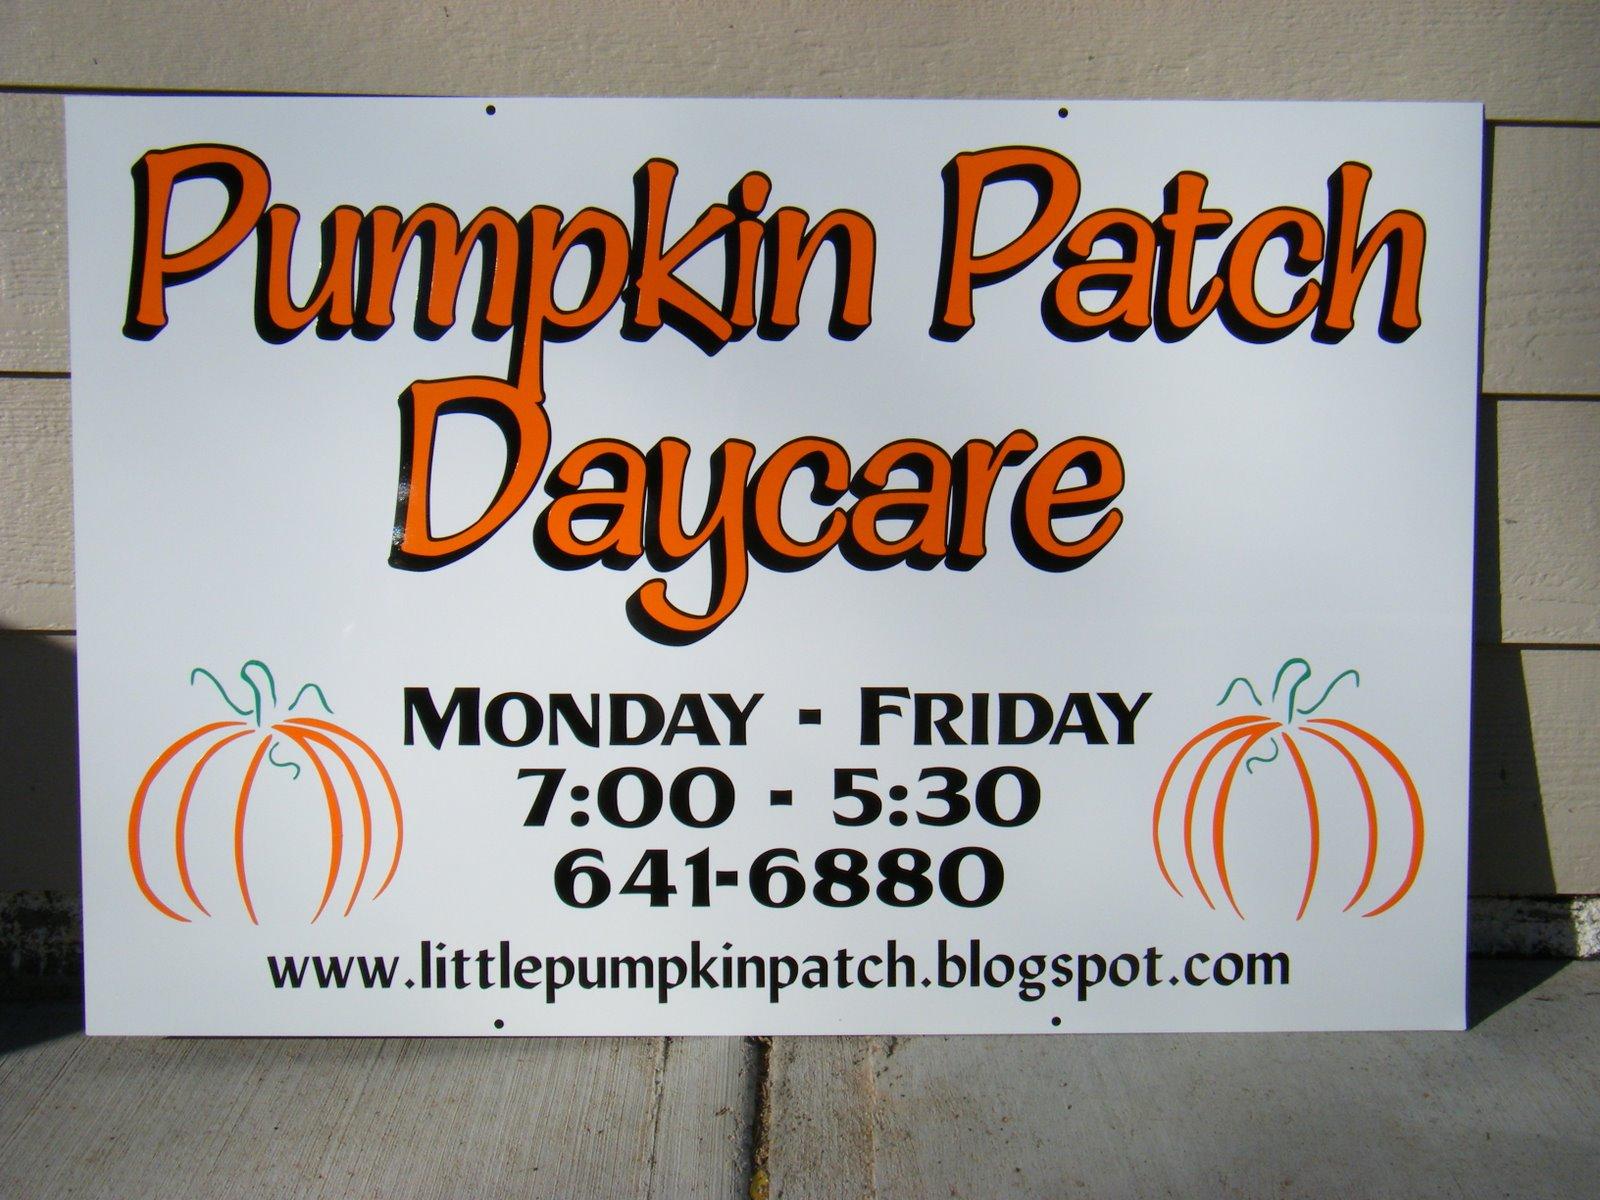 Pumpkin Patch Daycare